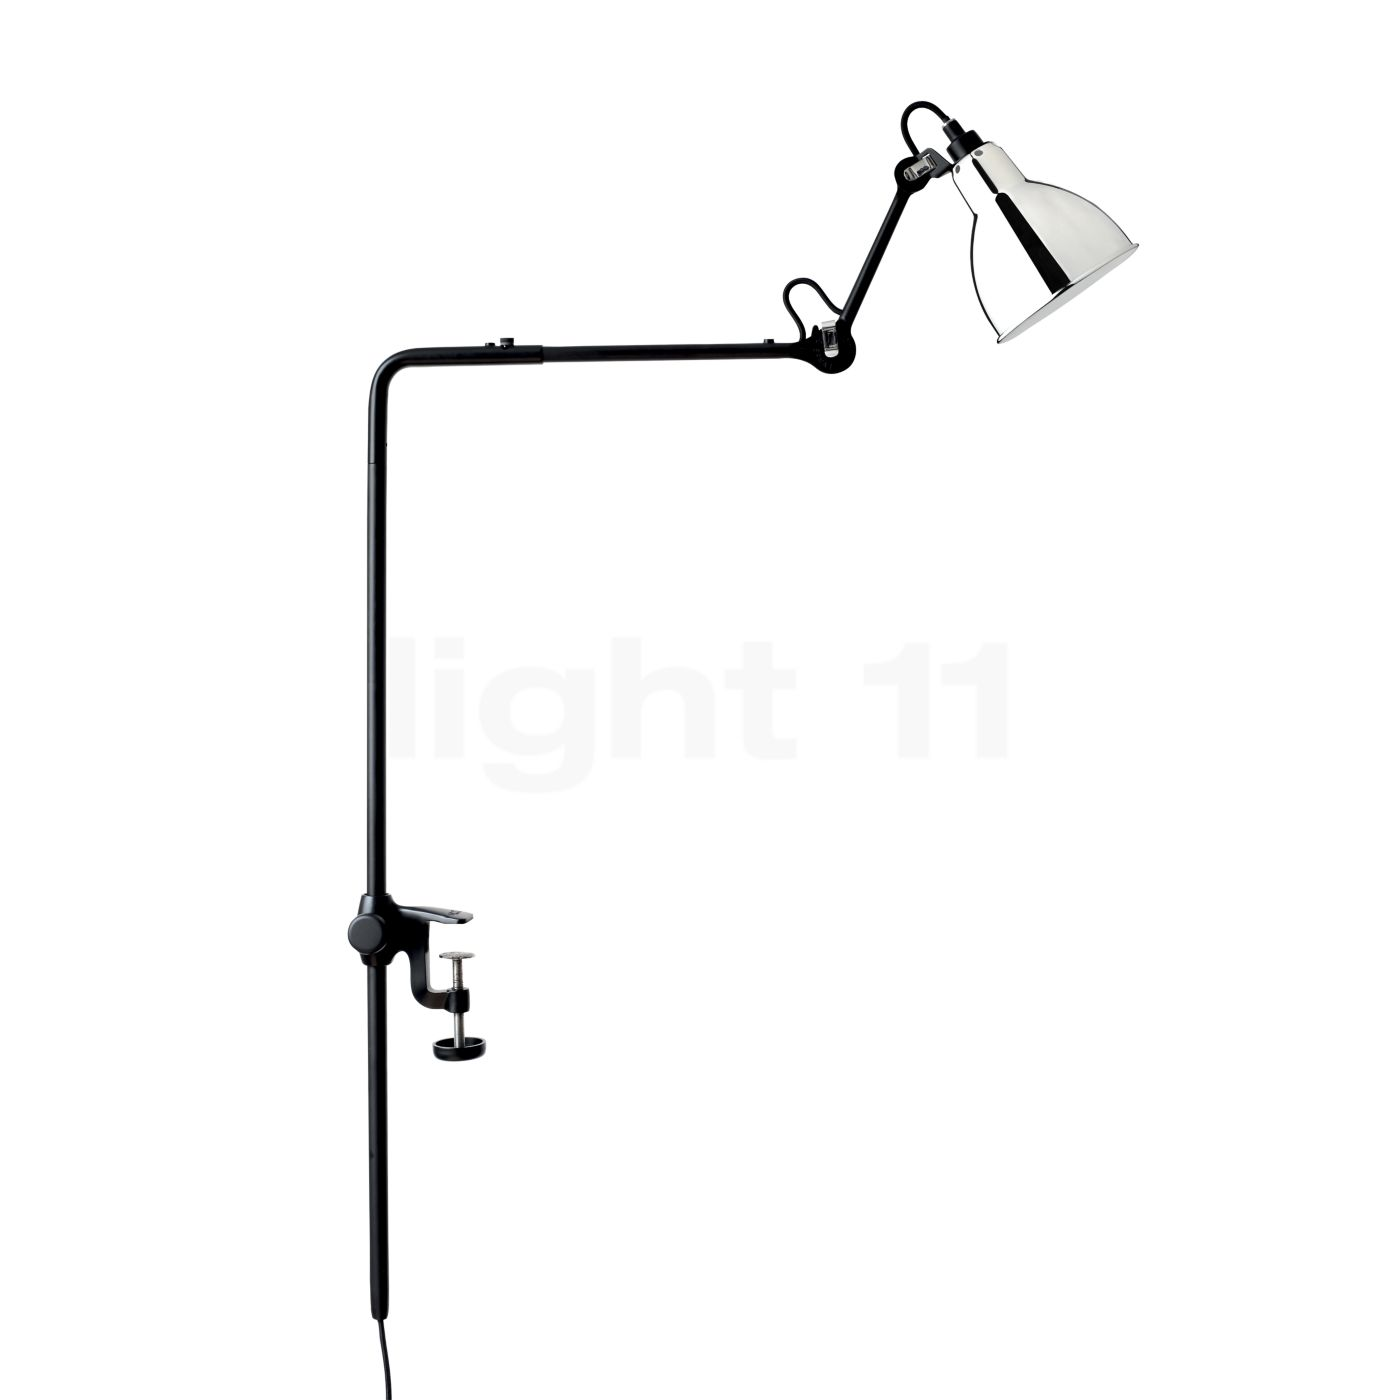 DCW Lampe Gras No 226 Klemmleuchte, Chrom 226 BL-CH